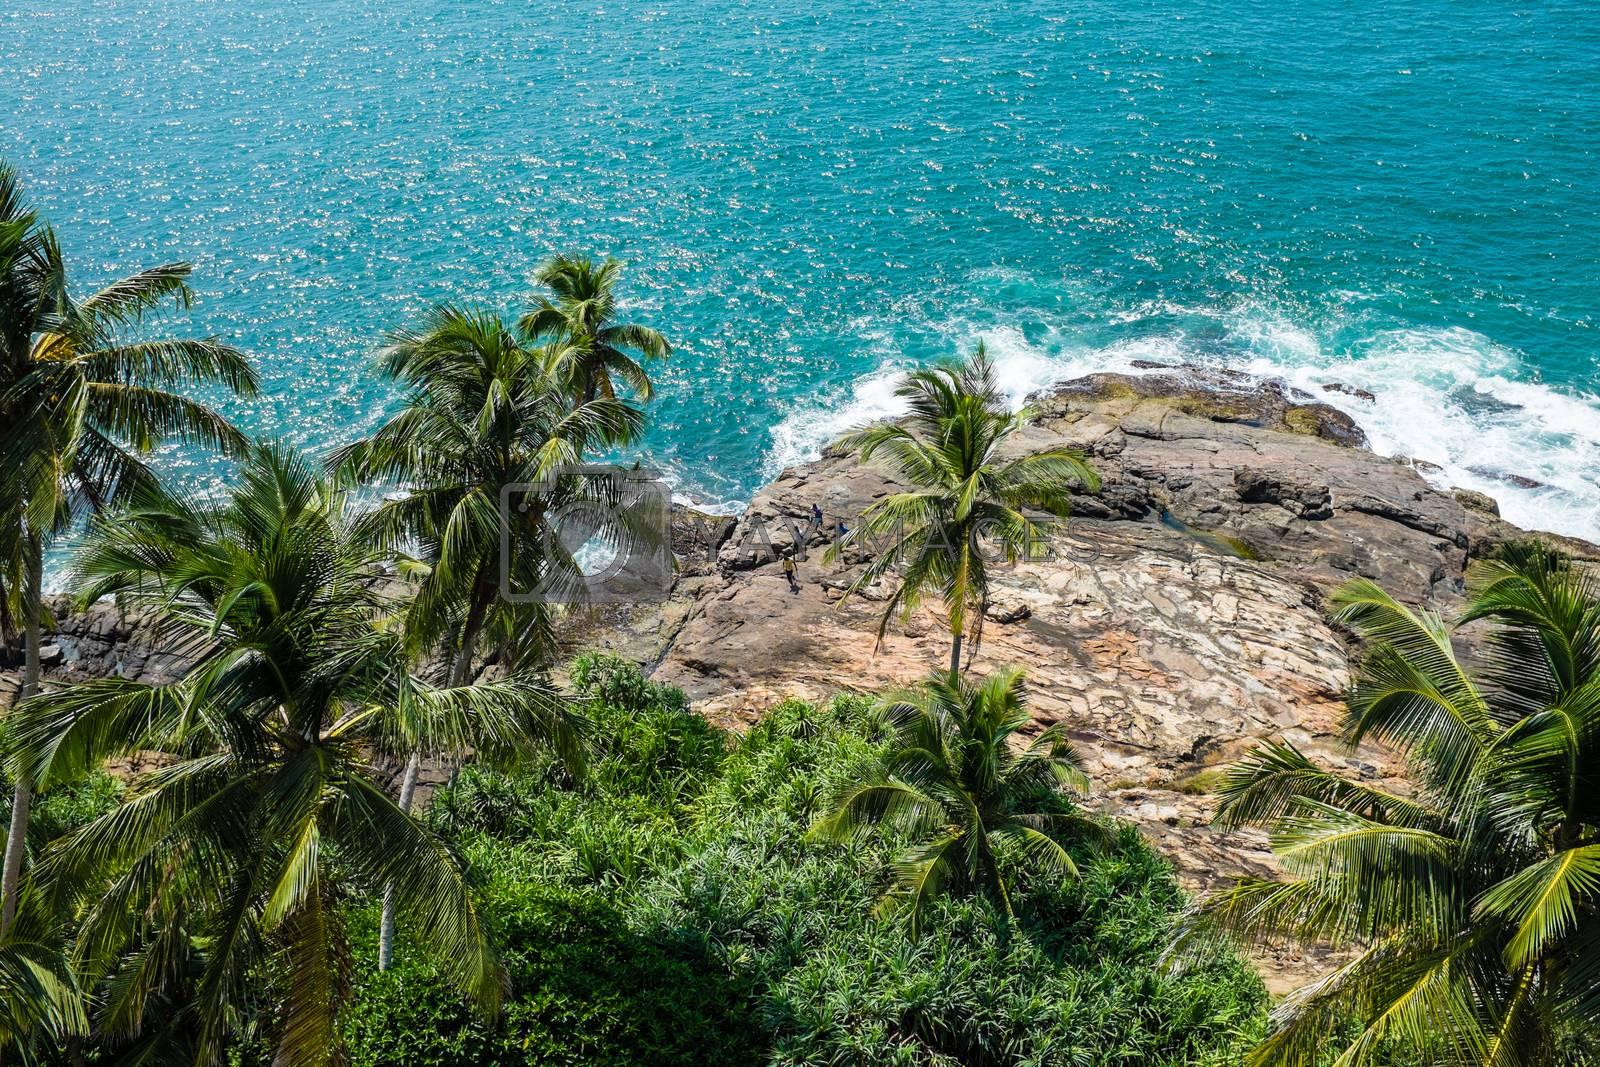 Indian ocean beach near Beruwala, Sri-Lanka